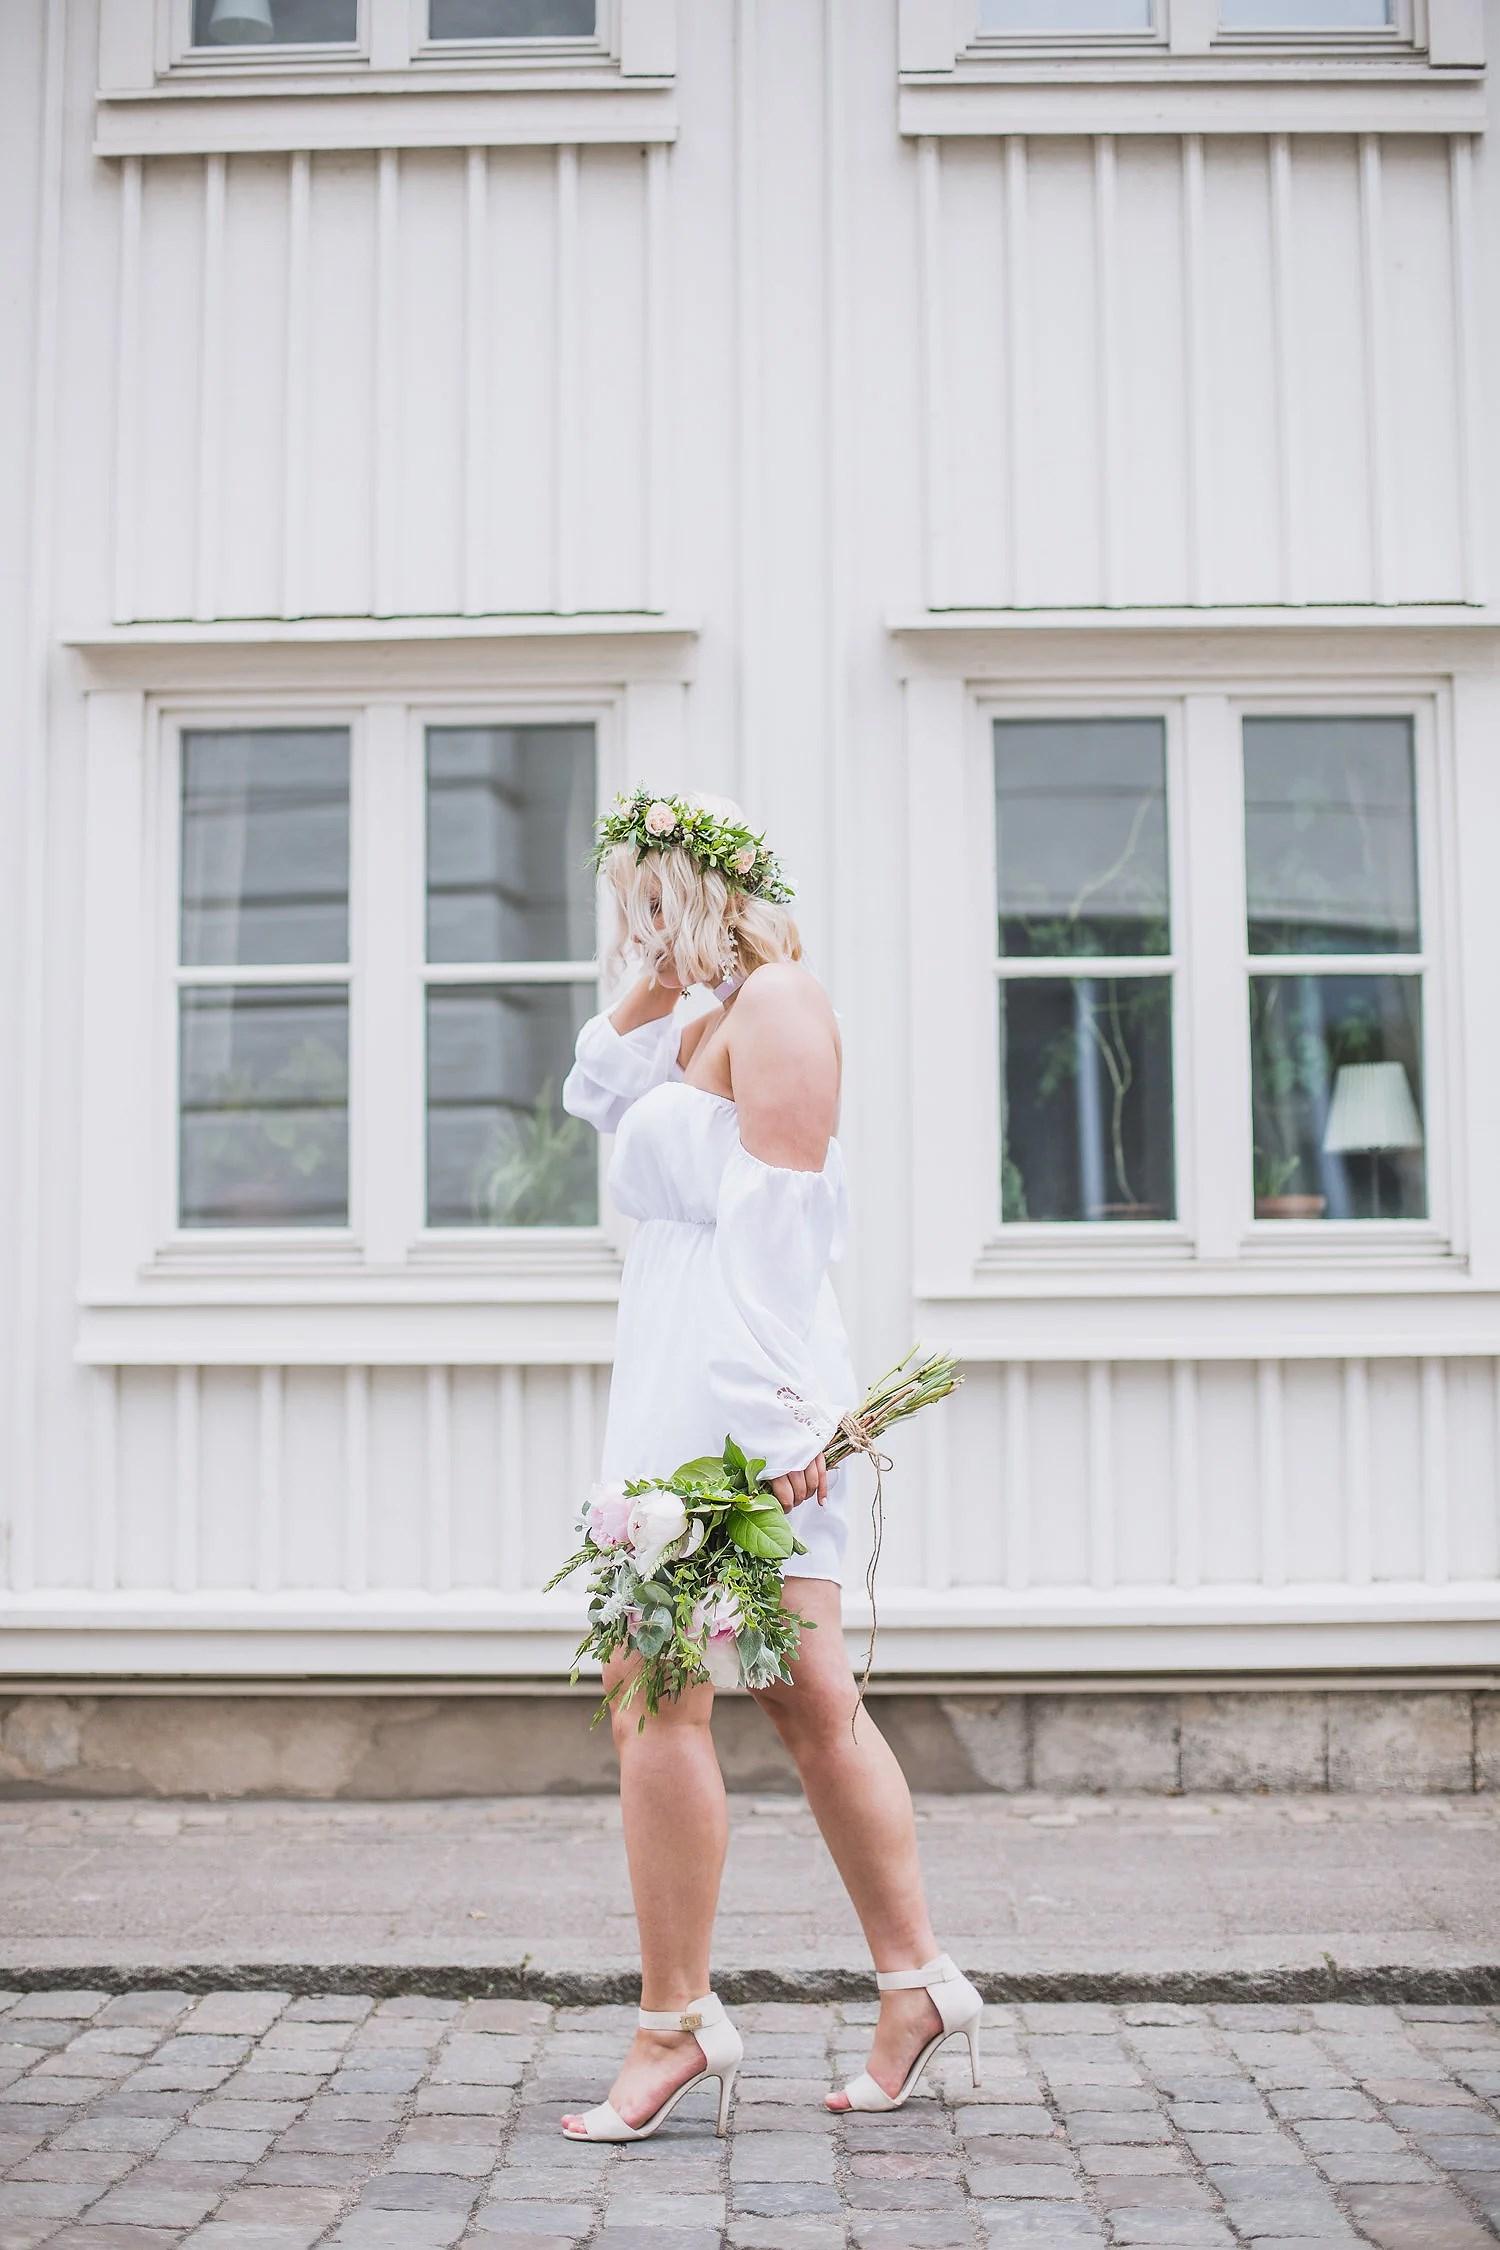 White dress + flowers